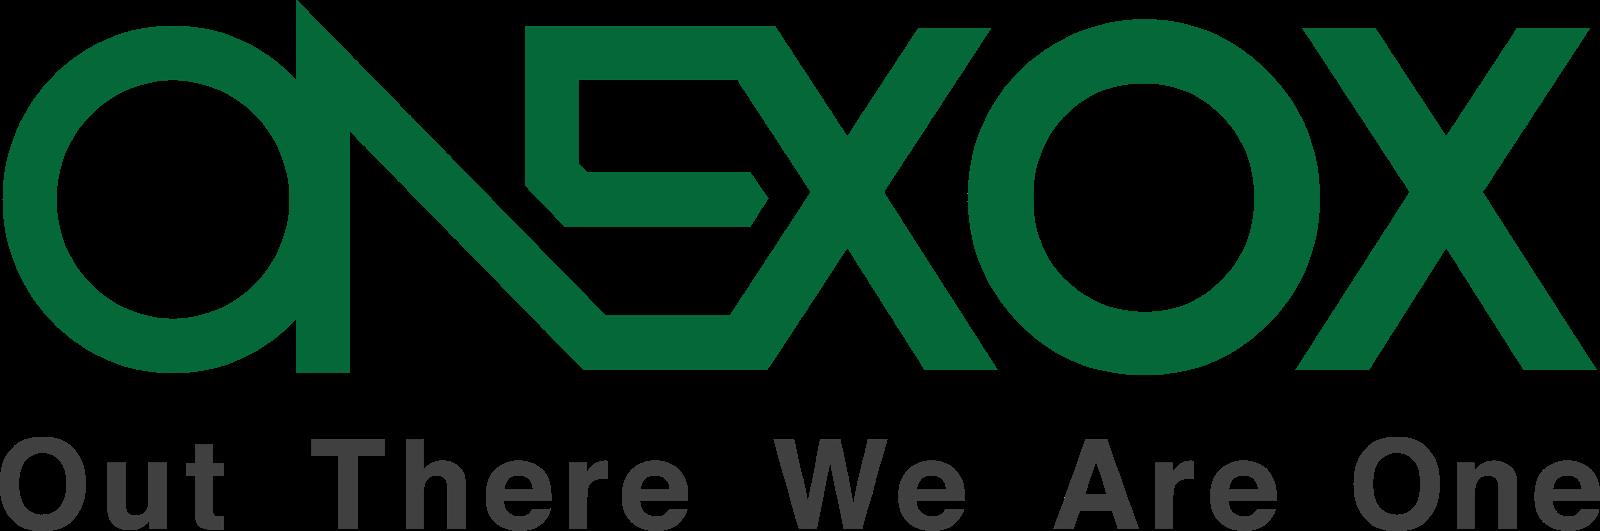 ONEXOX - Simkad Prepaid, Black & XOX eSIM